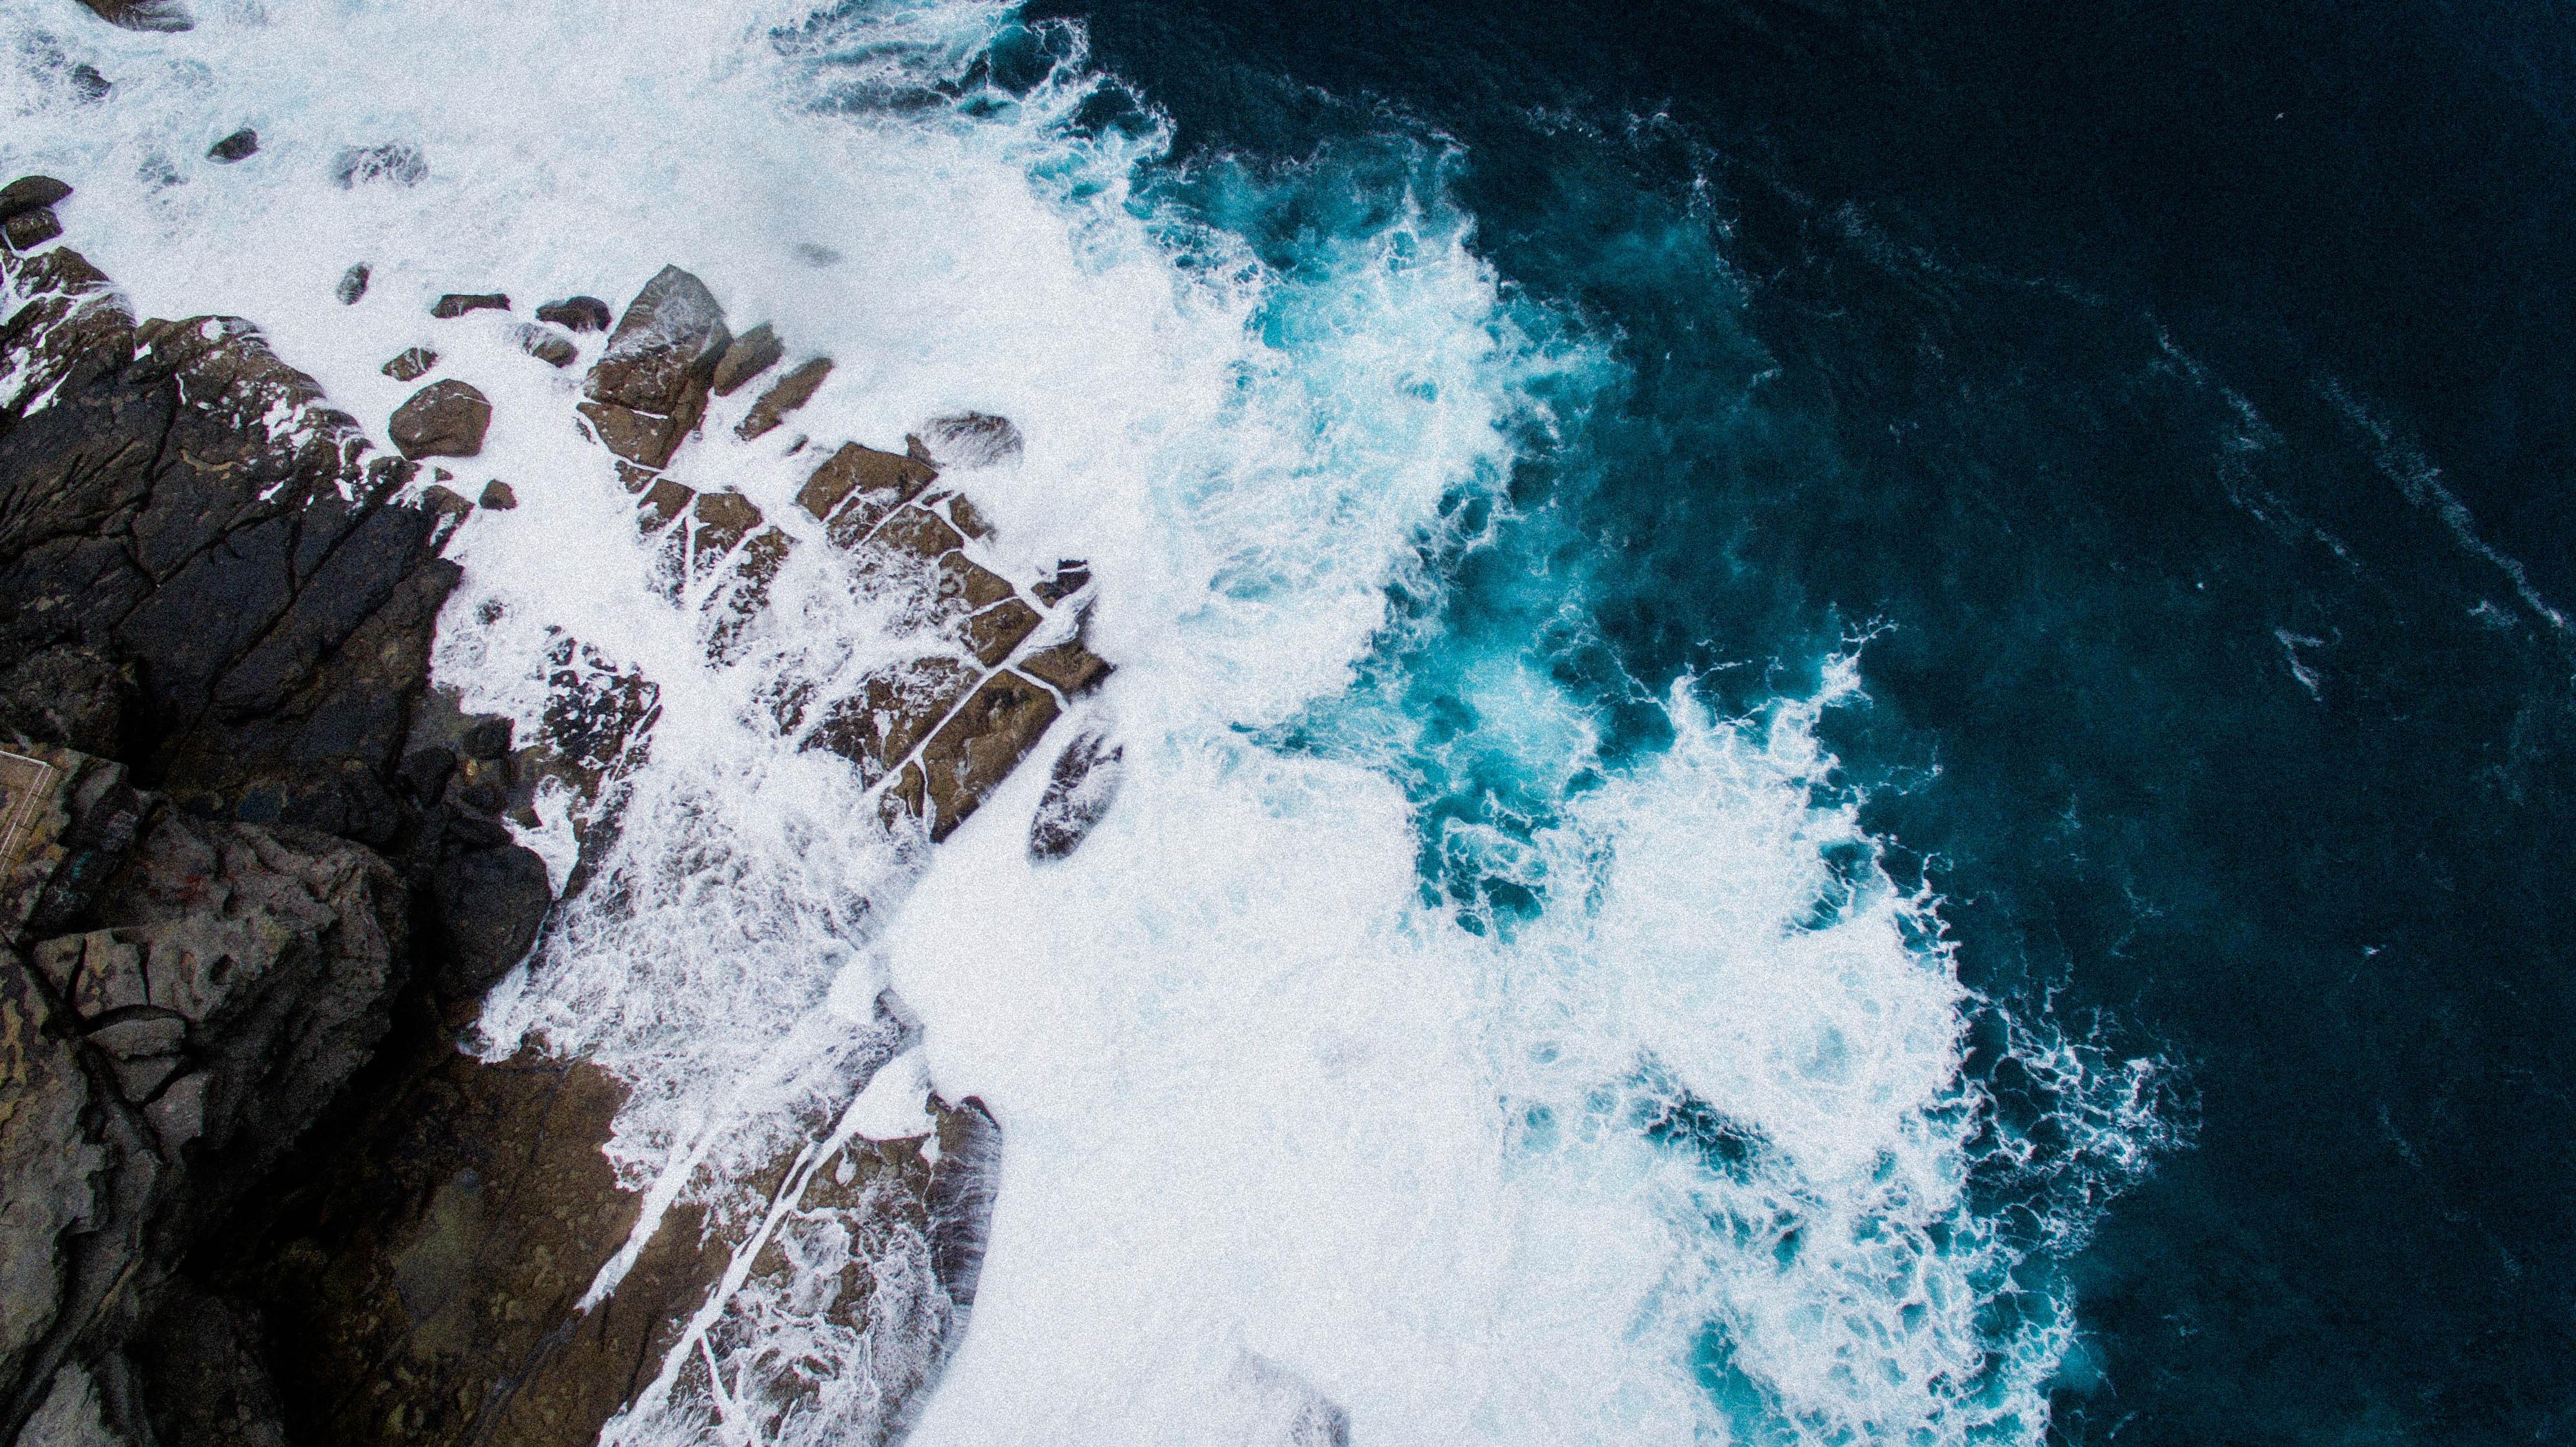 Drone aerial view of the ocean crashing on a rocky Bondi Beach